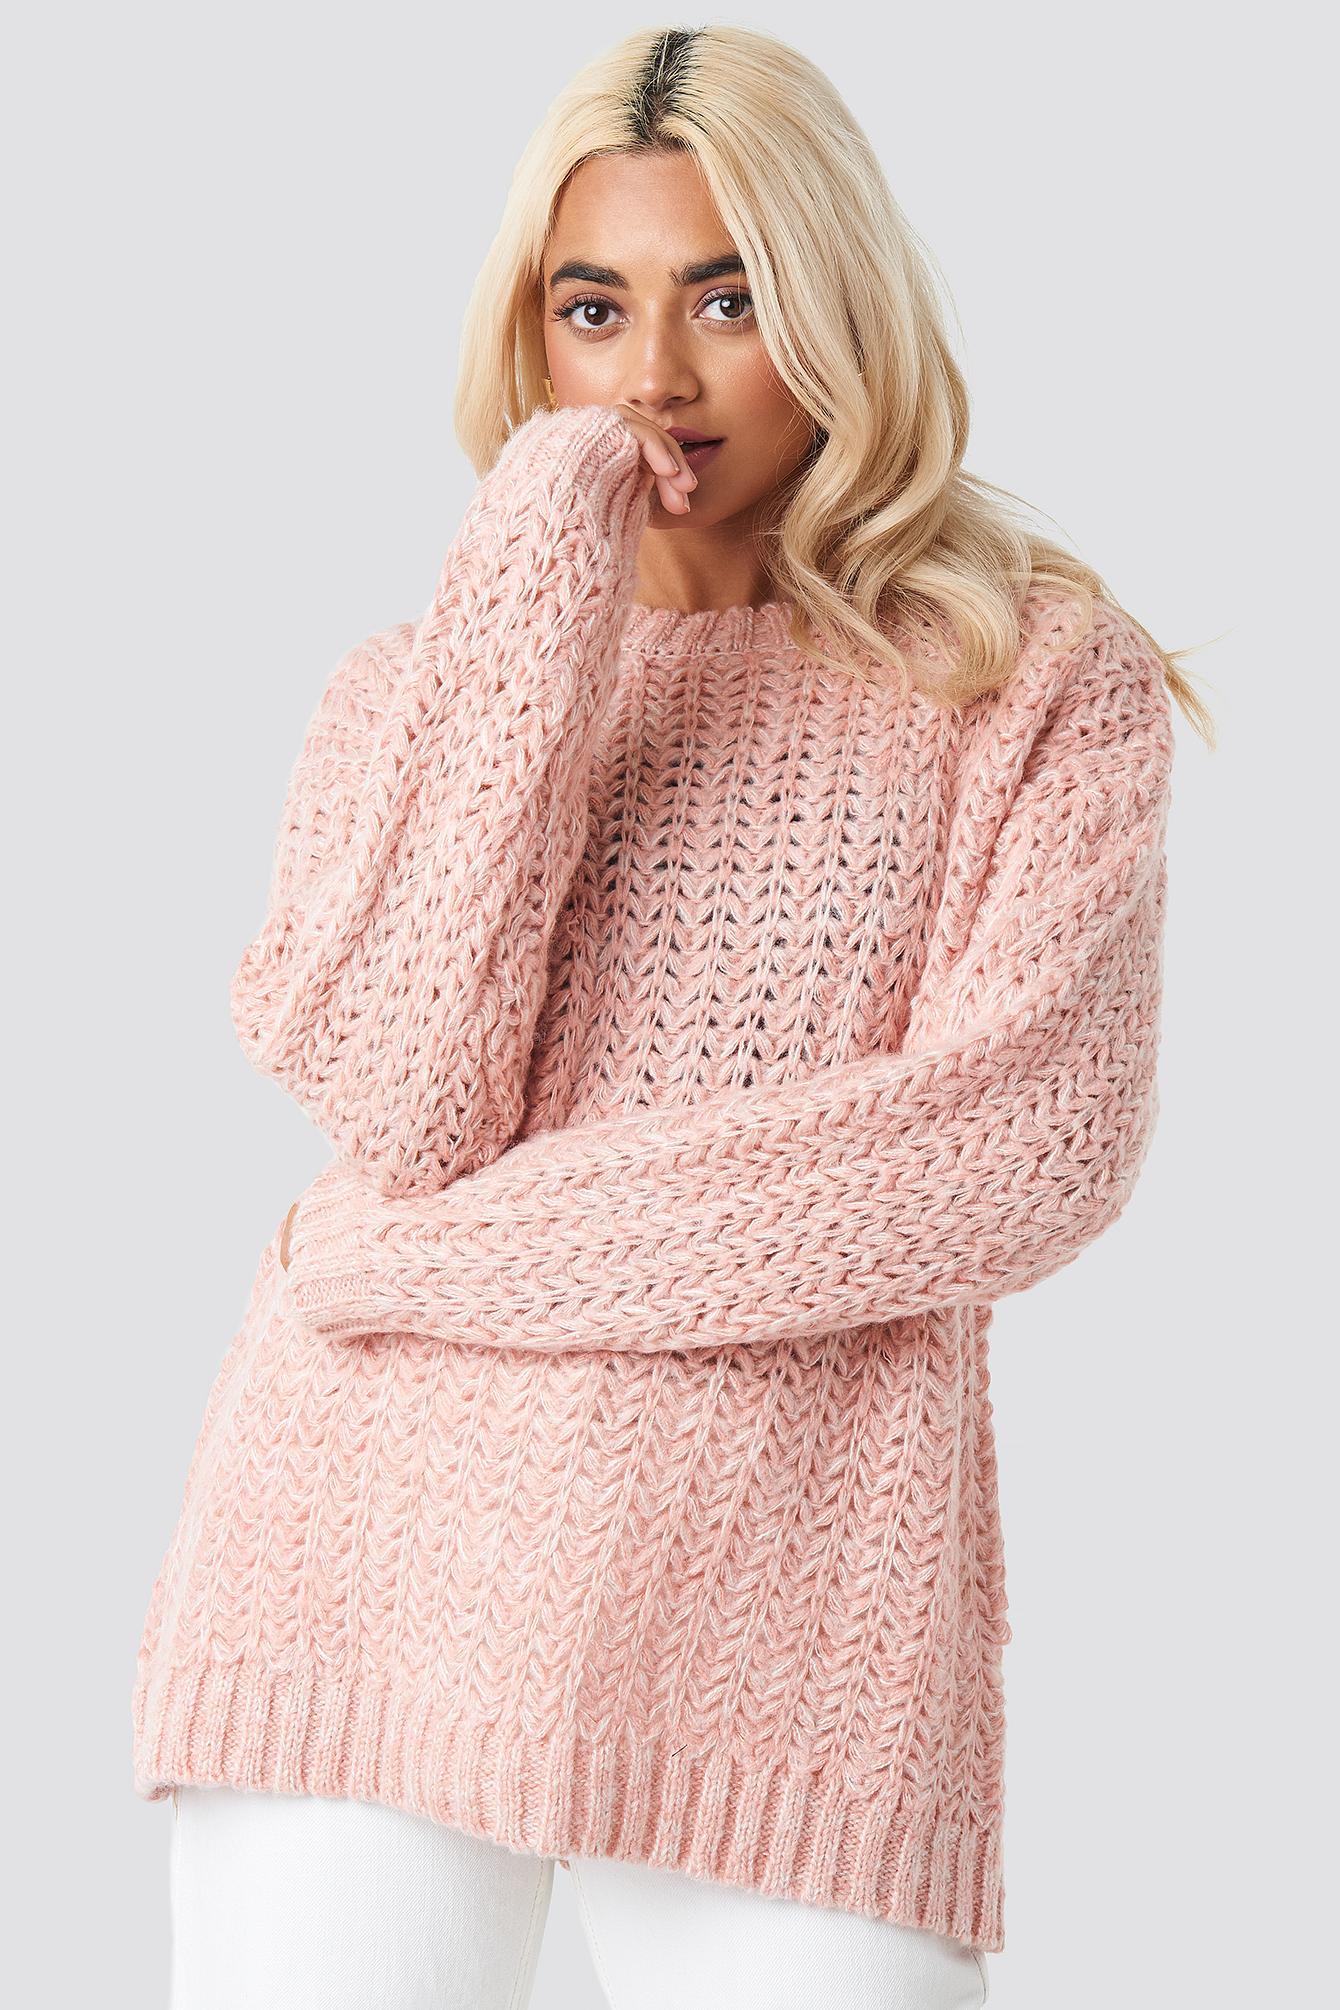 mango -  Tauro Sweater - Pink